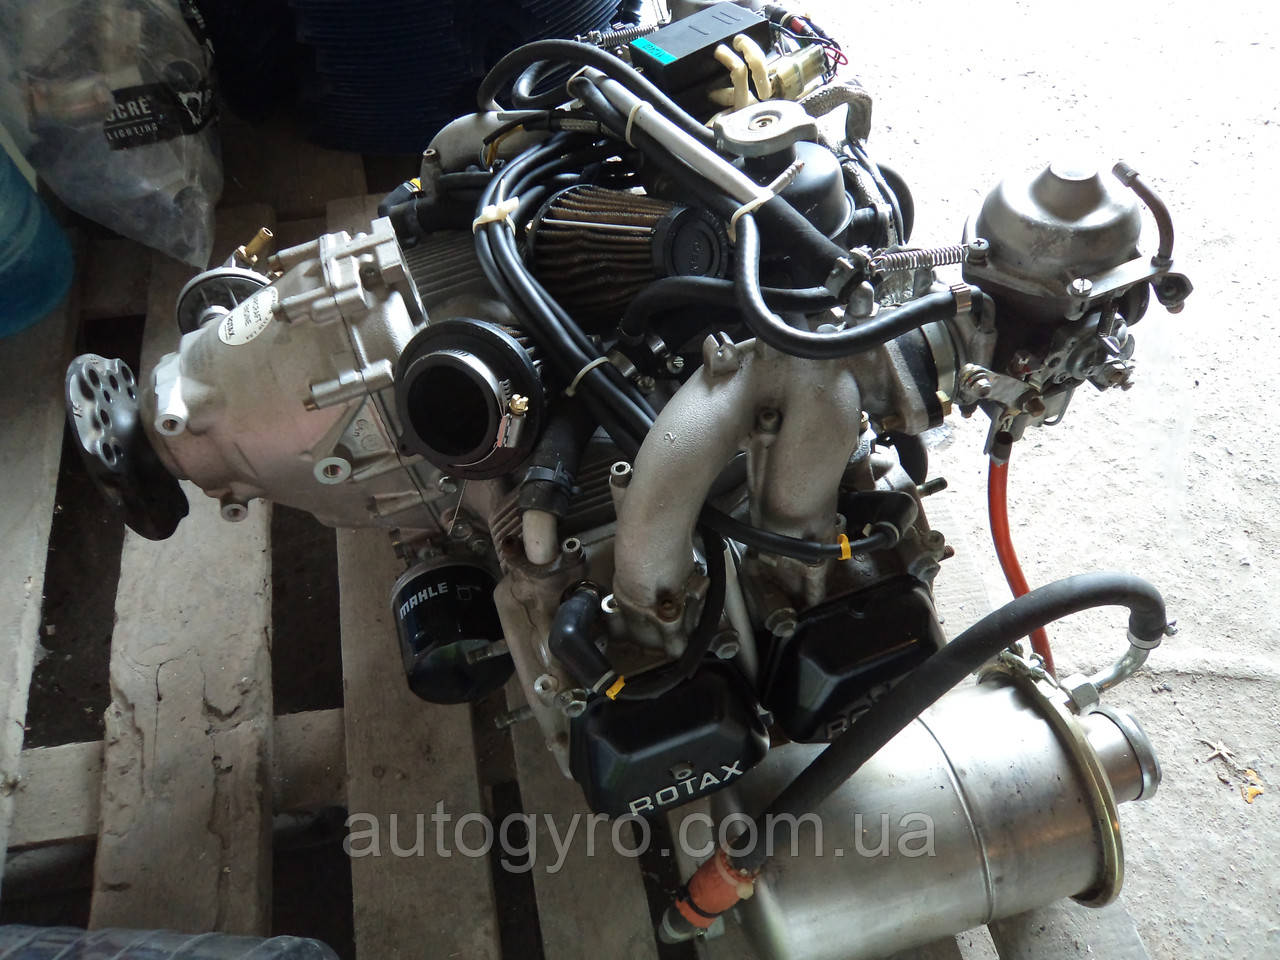 Двигатель ROTAX 912 UL б/у